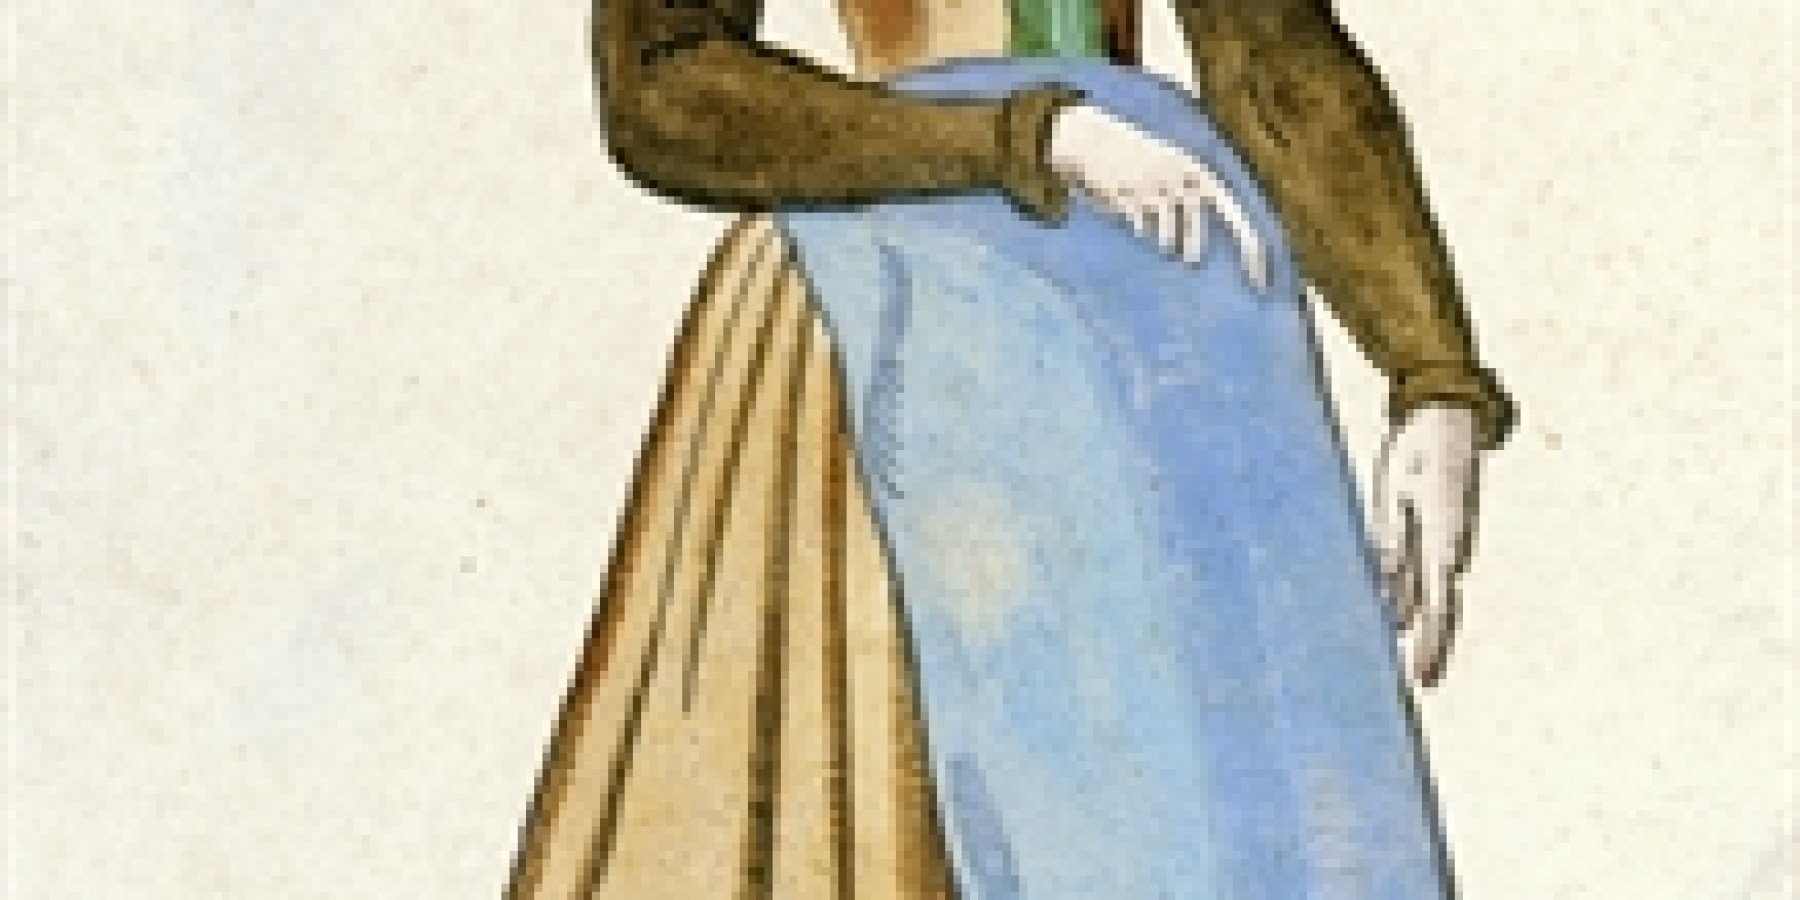 Frauengeschichte(n) im Stadtmuseum